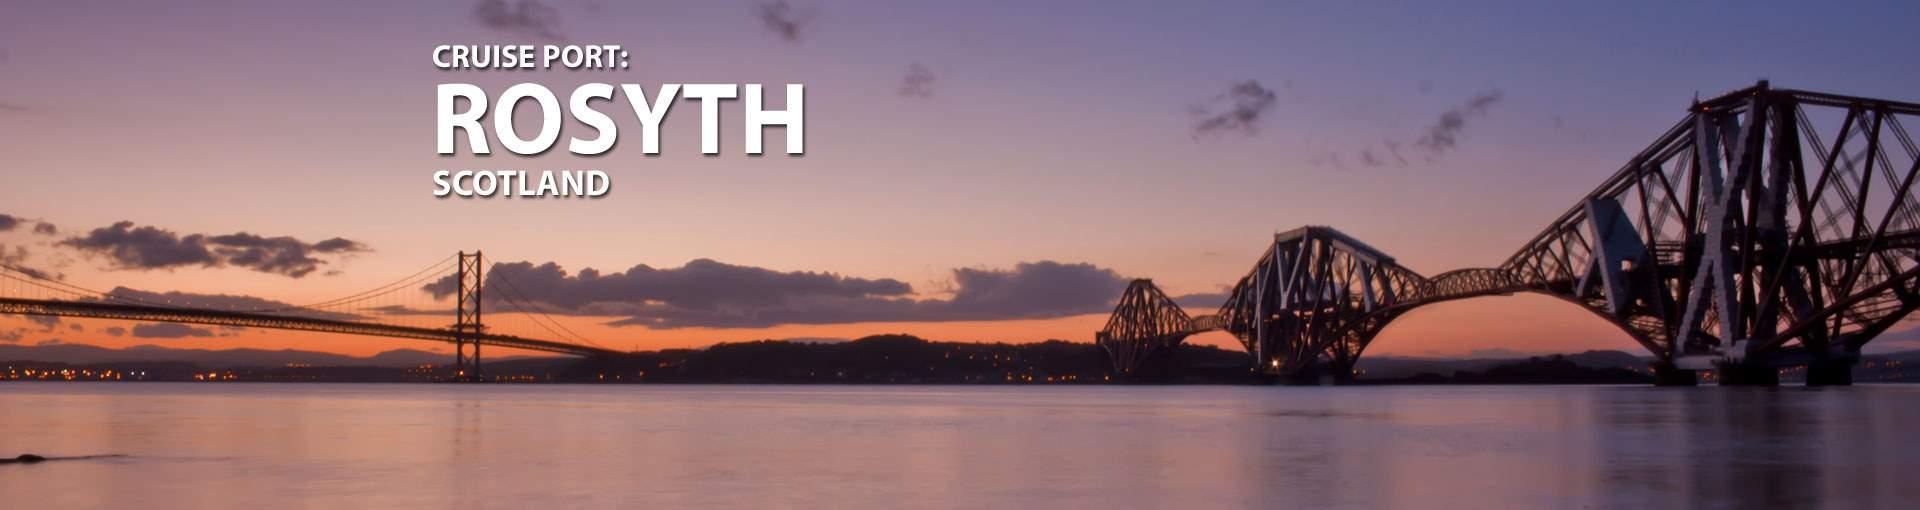 Cruises to Rosyth, Scotland